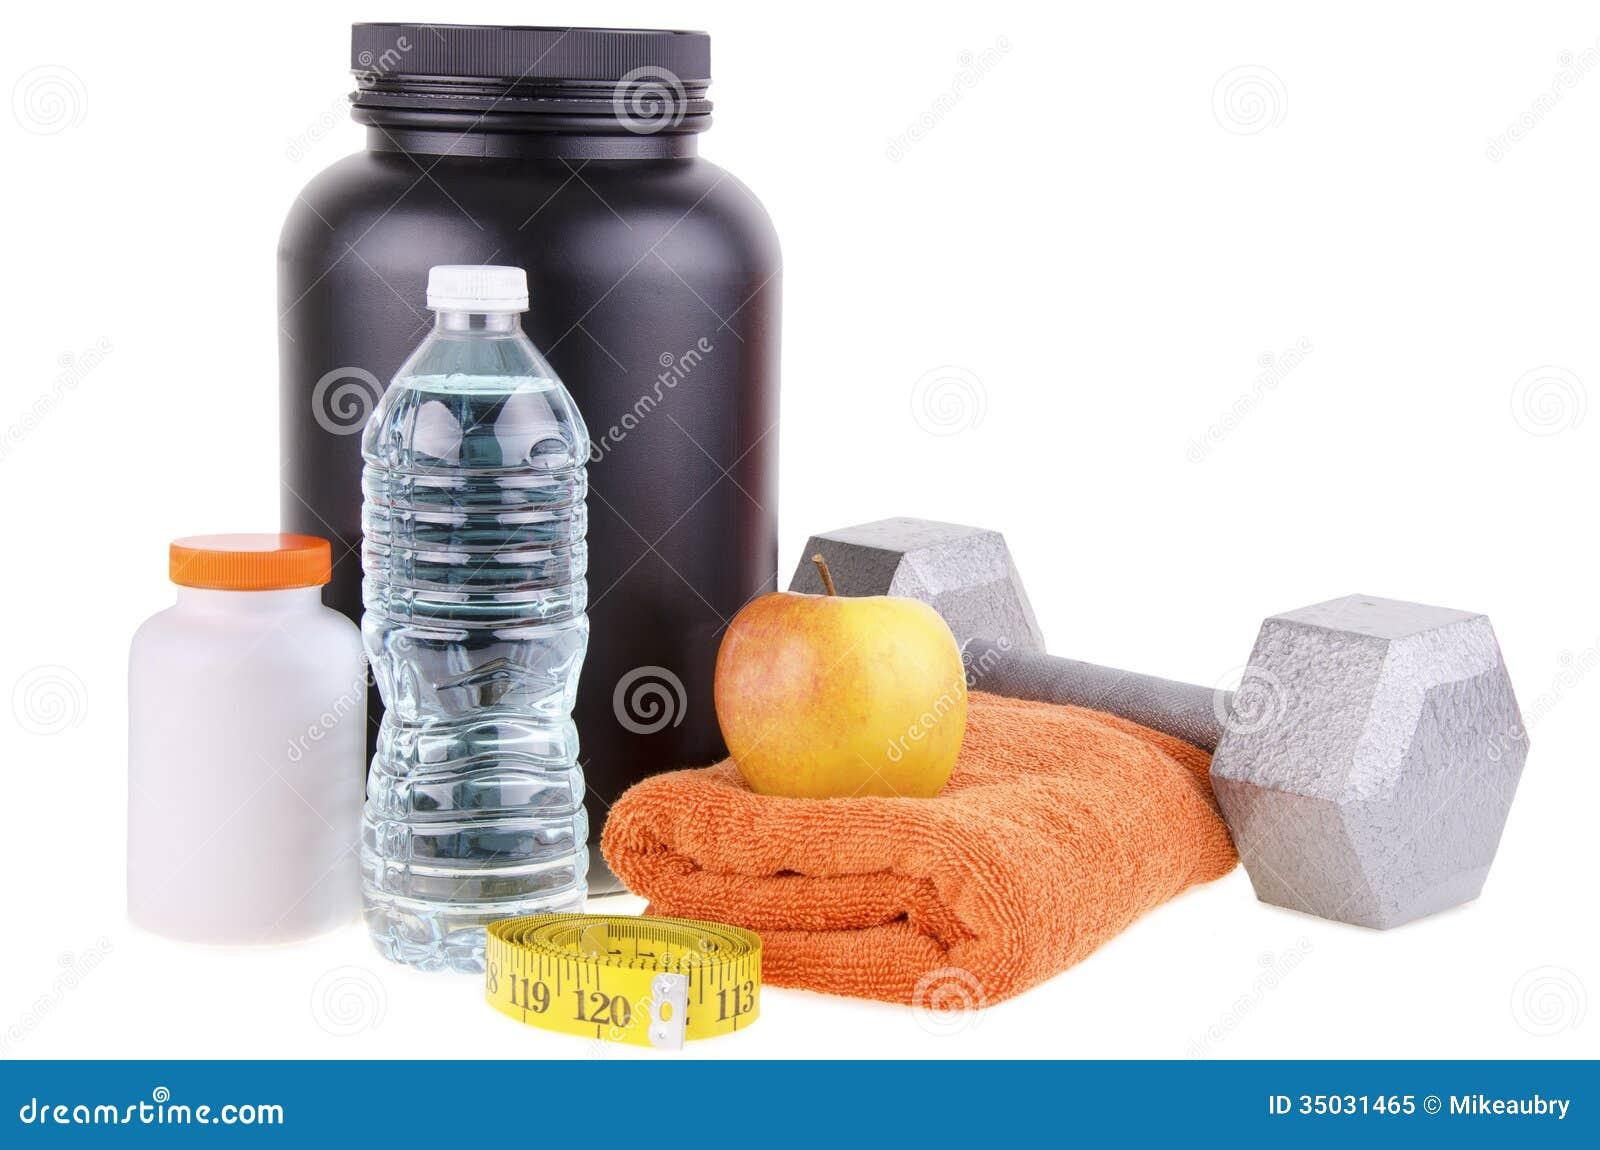 Healthy Lifestyle Royalty Free Stock Photo - Image: 35031465